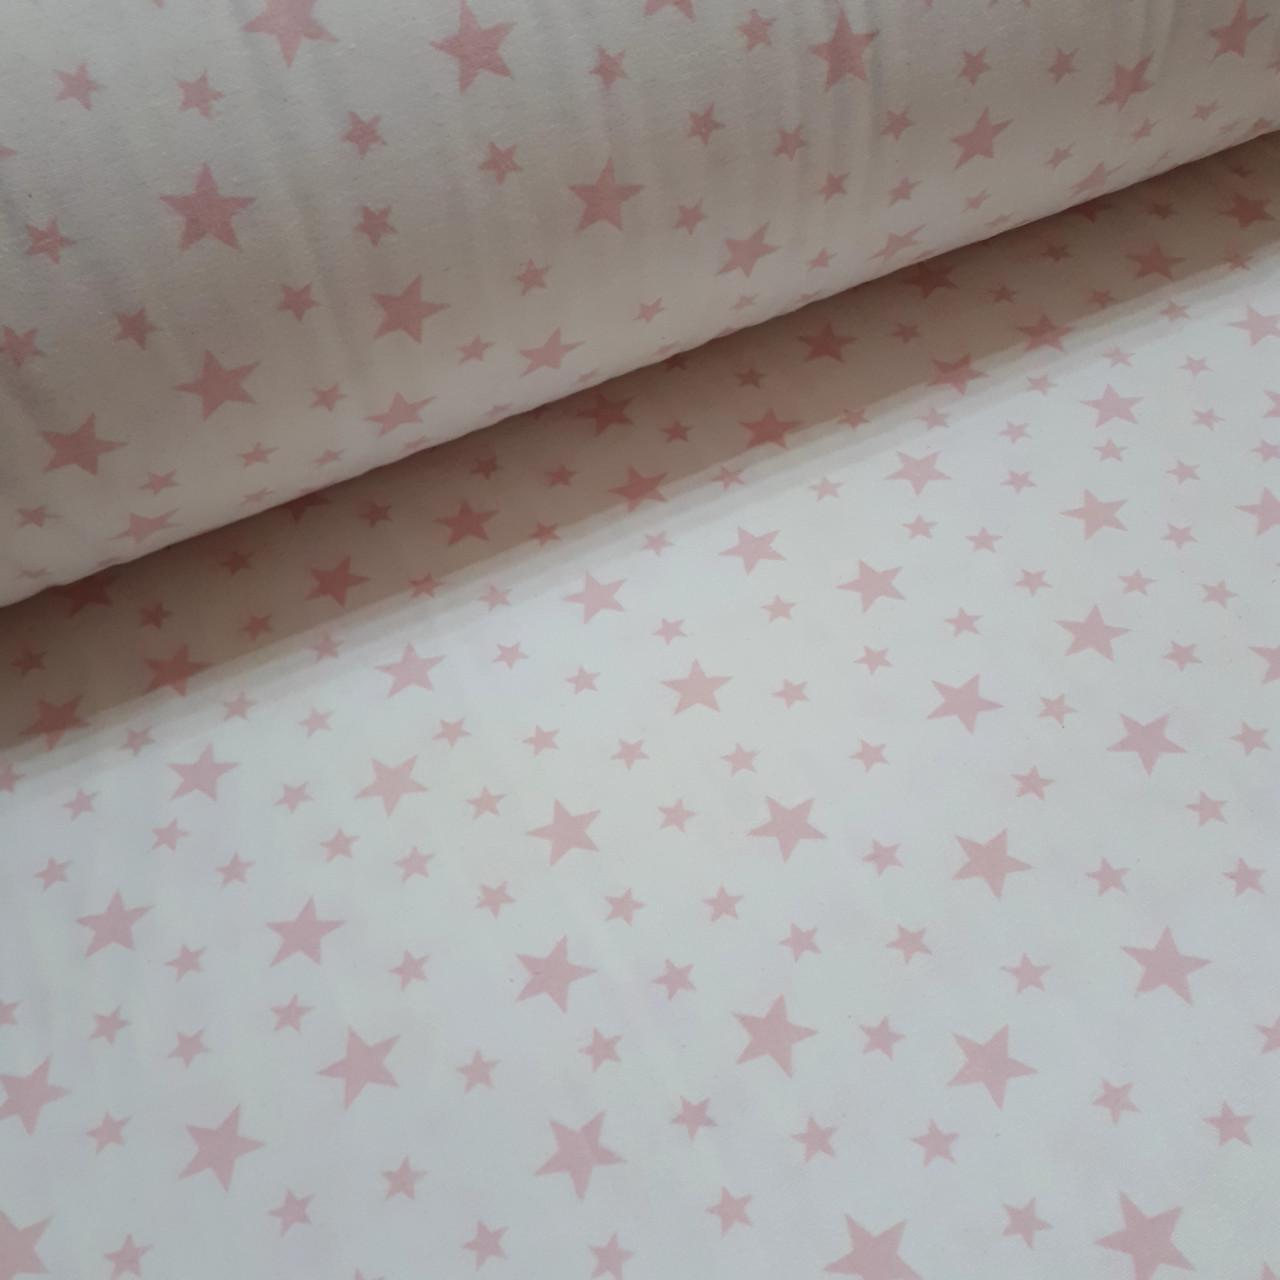 Фланелевая ткань розовые звезды на белом (шир. 2,4 м)